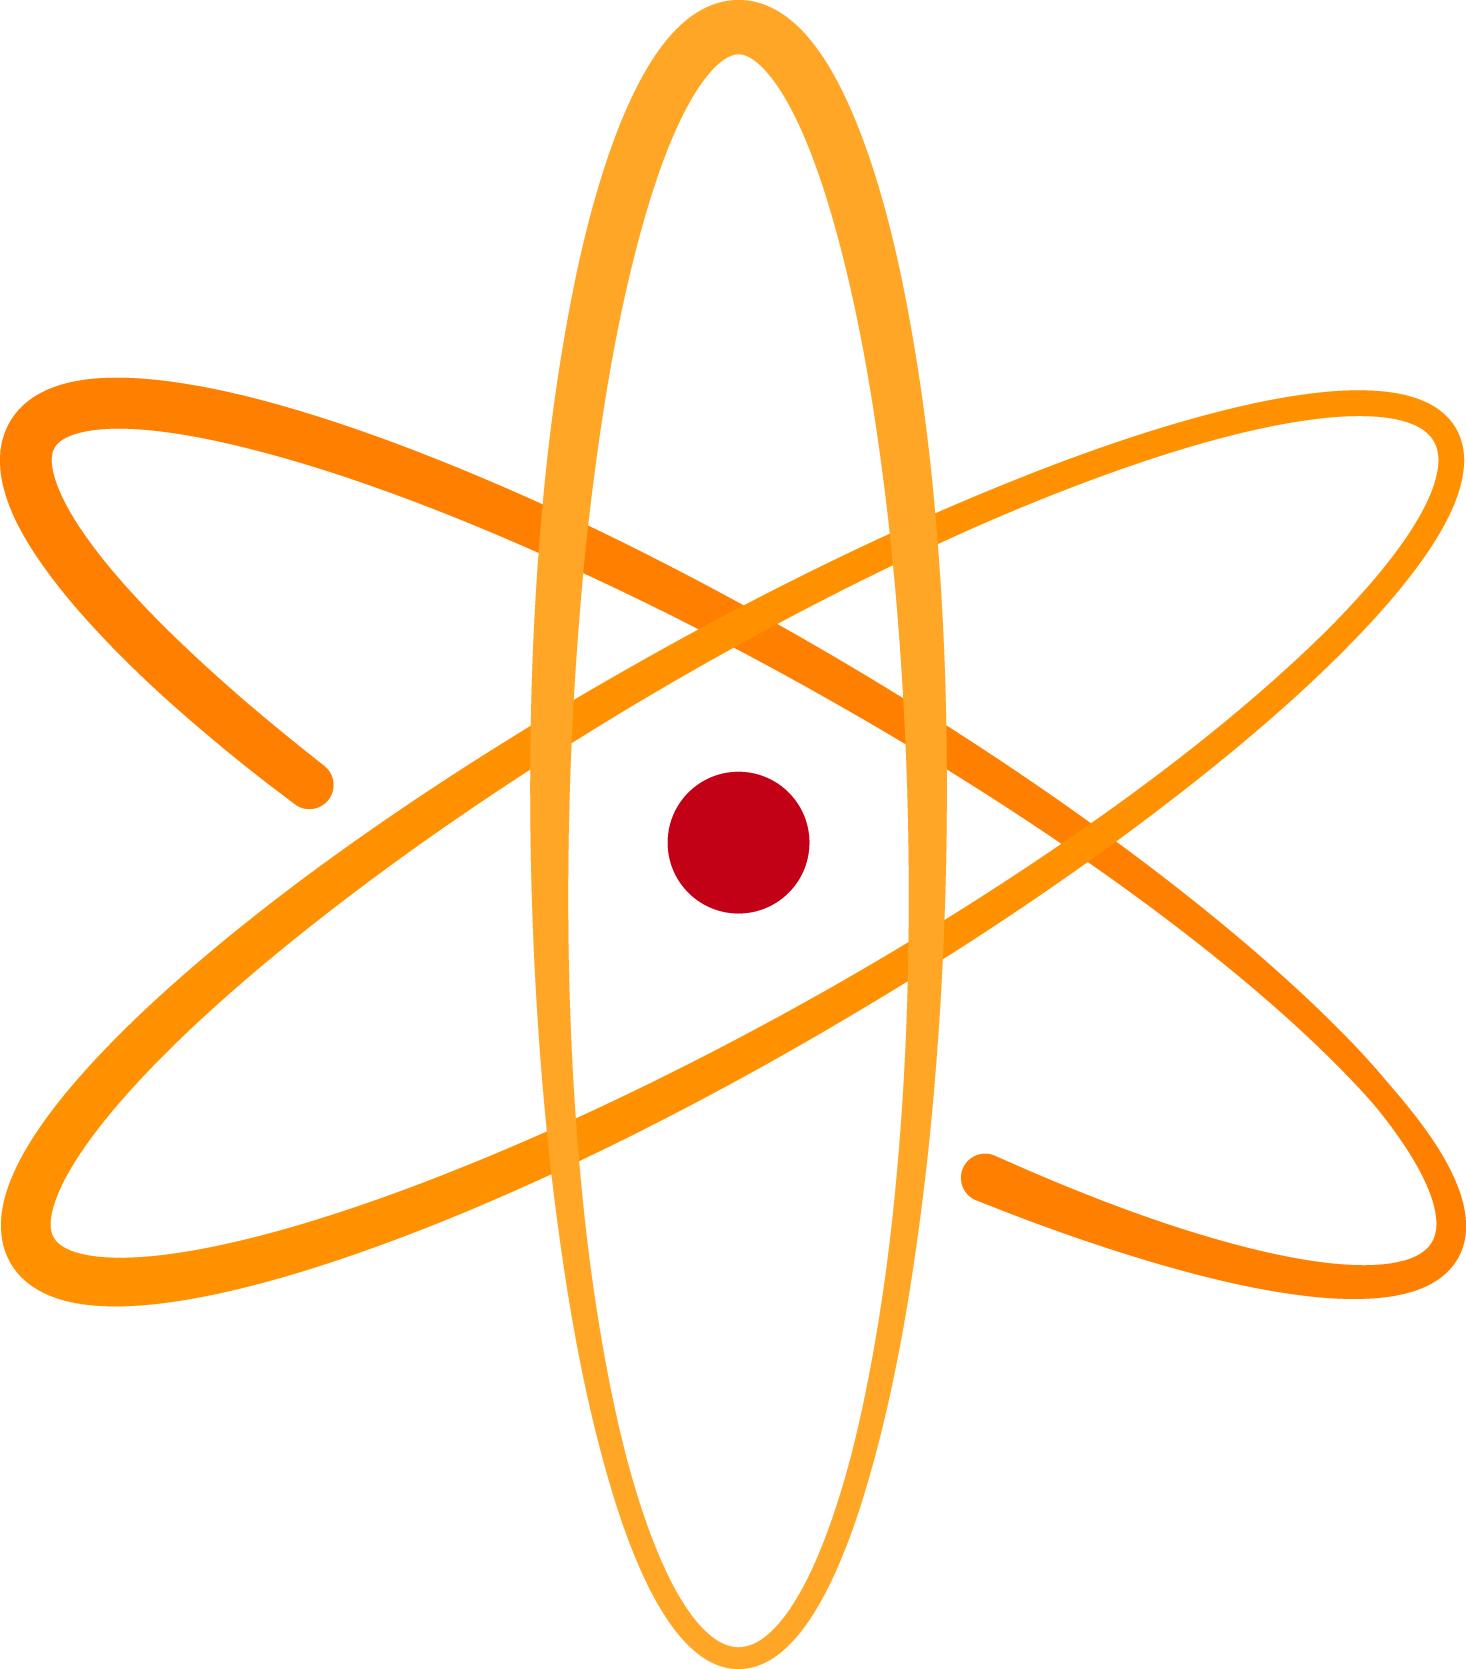 Finding the sterile neutrino. Atom clipart orange